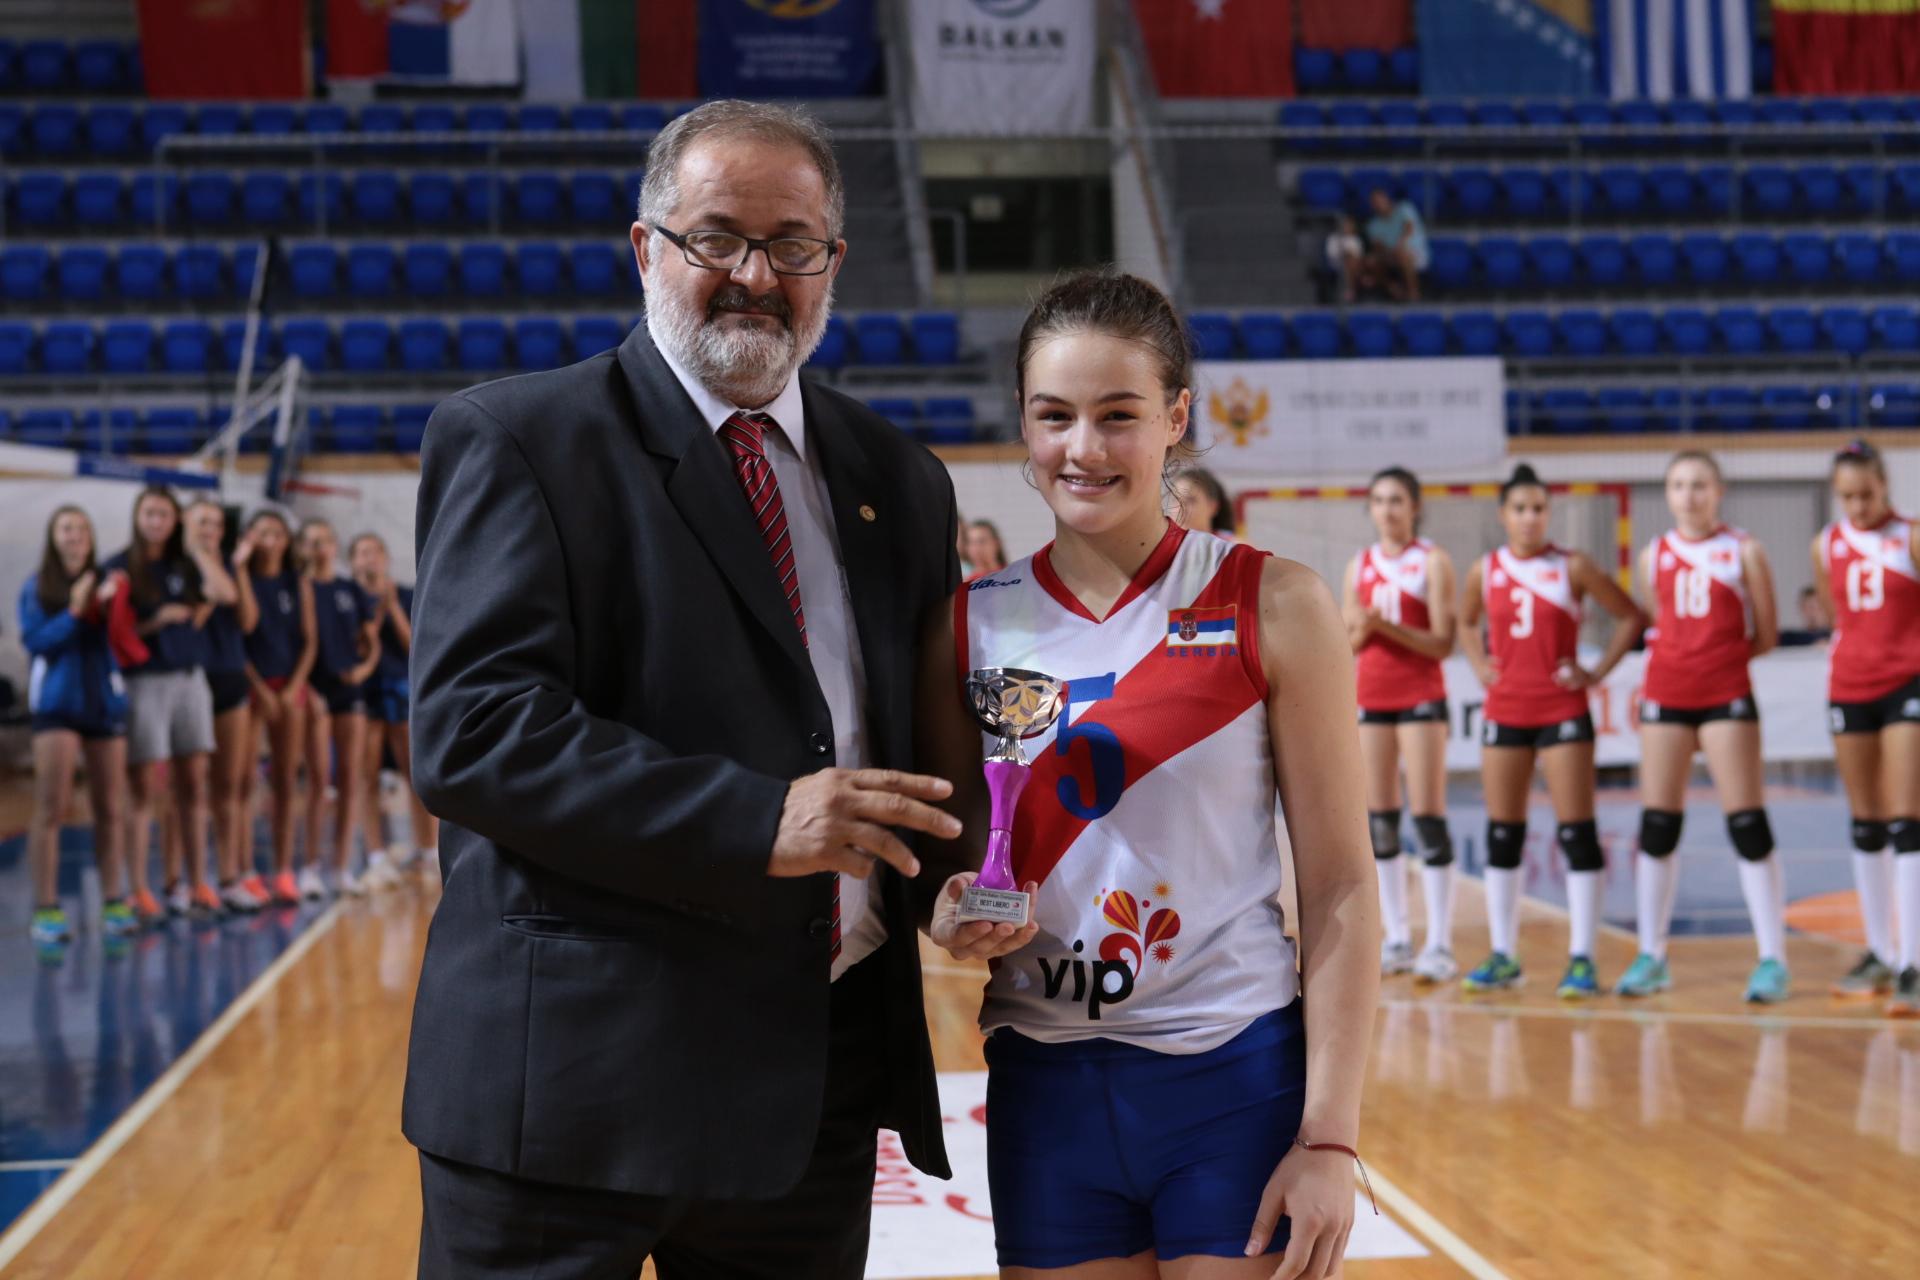 Mila Kocic najbolji libero